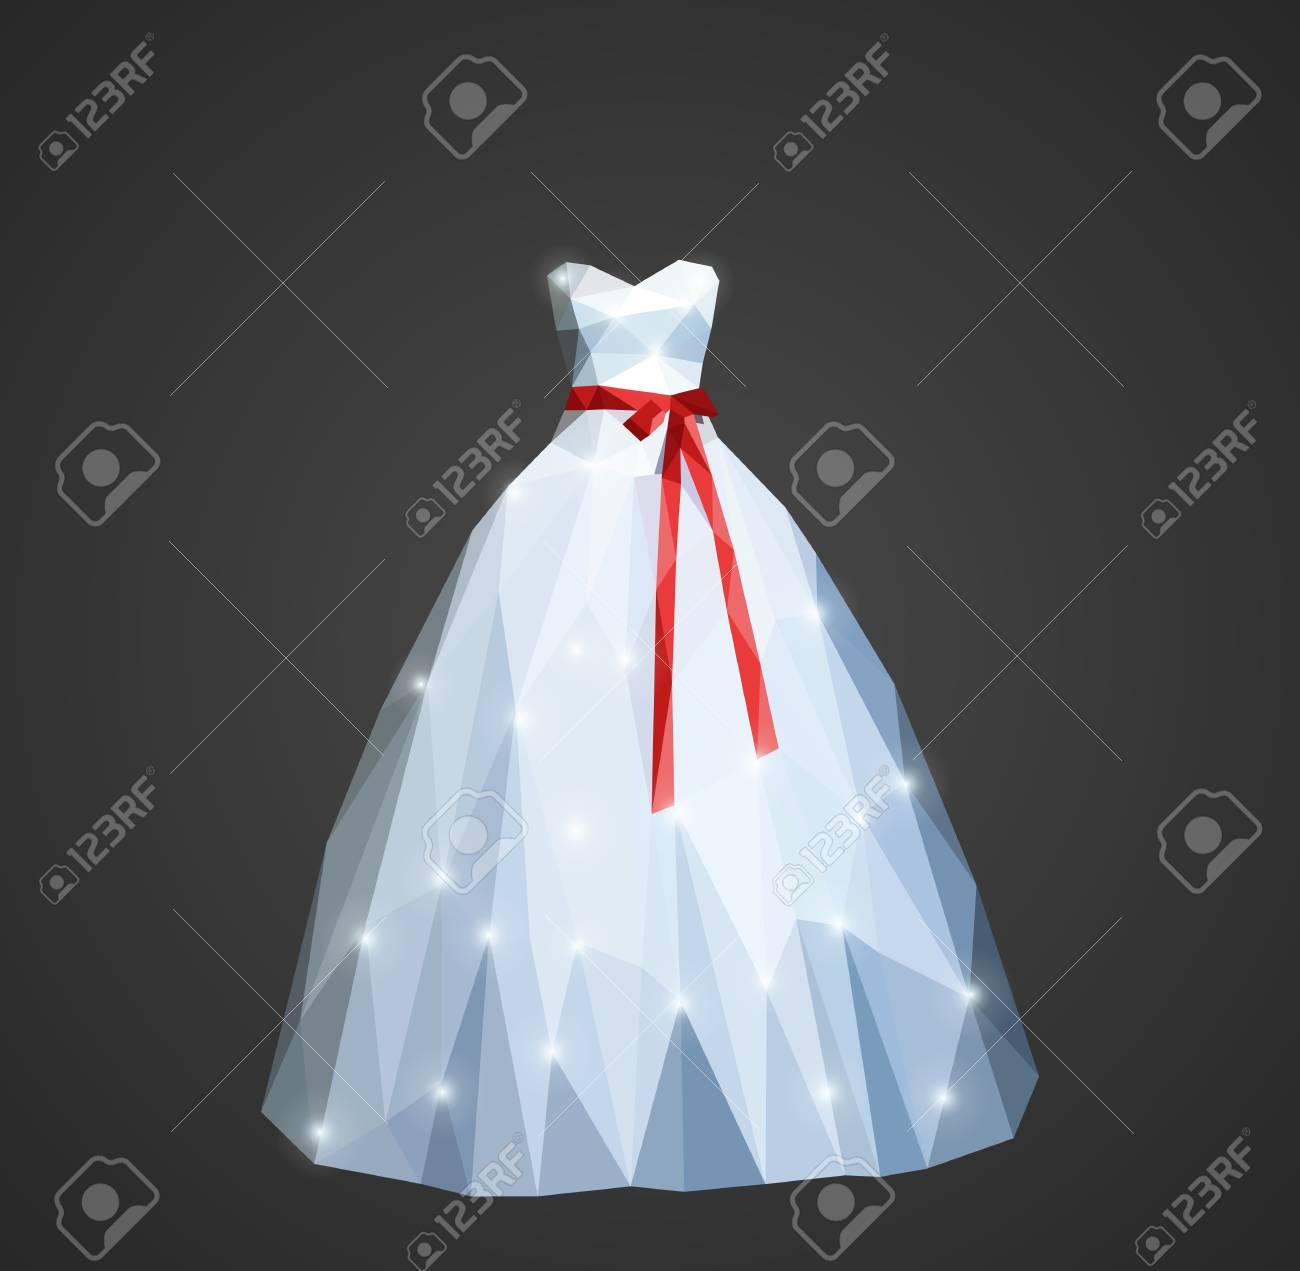 Vestido de novia en rojo